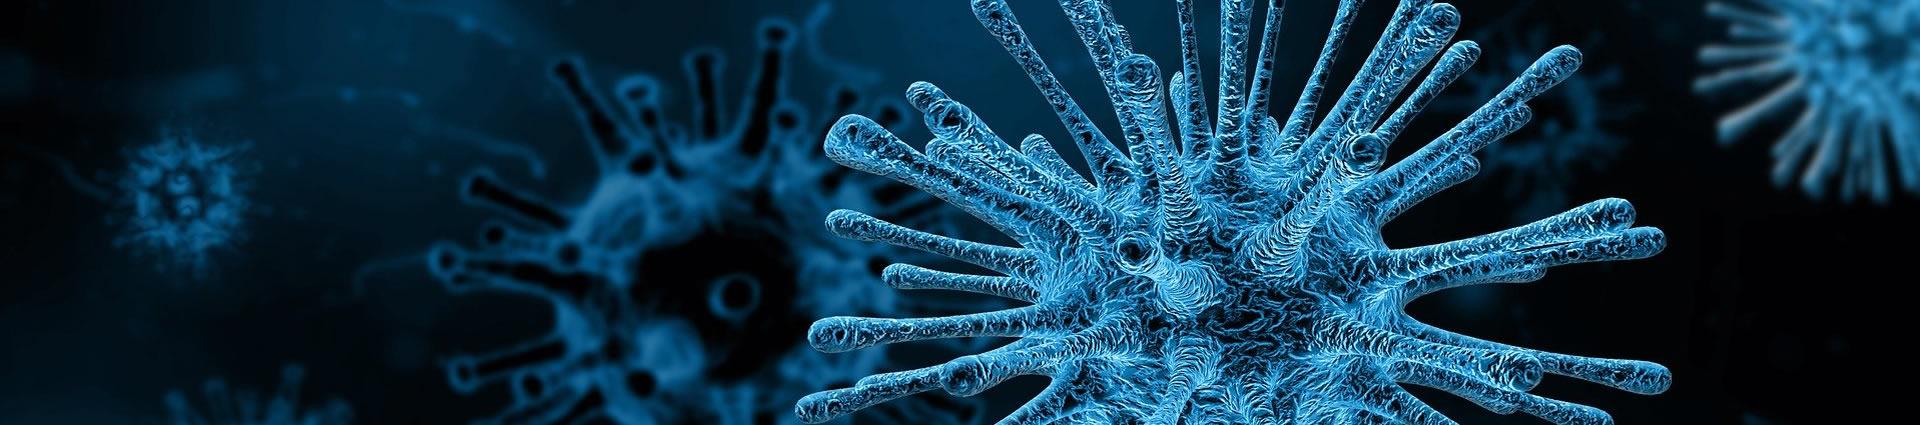 decalogo-manejo-ansiedad-por-coronavirus